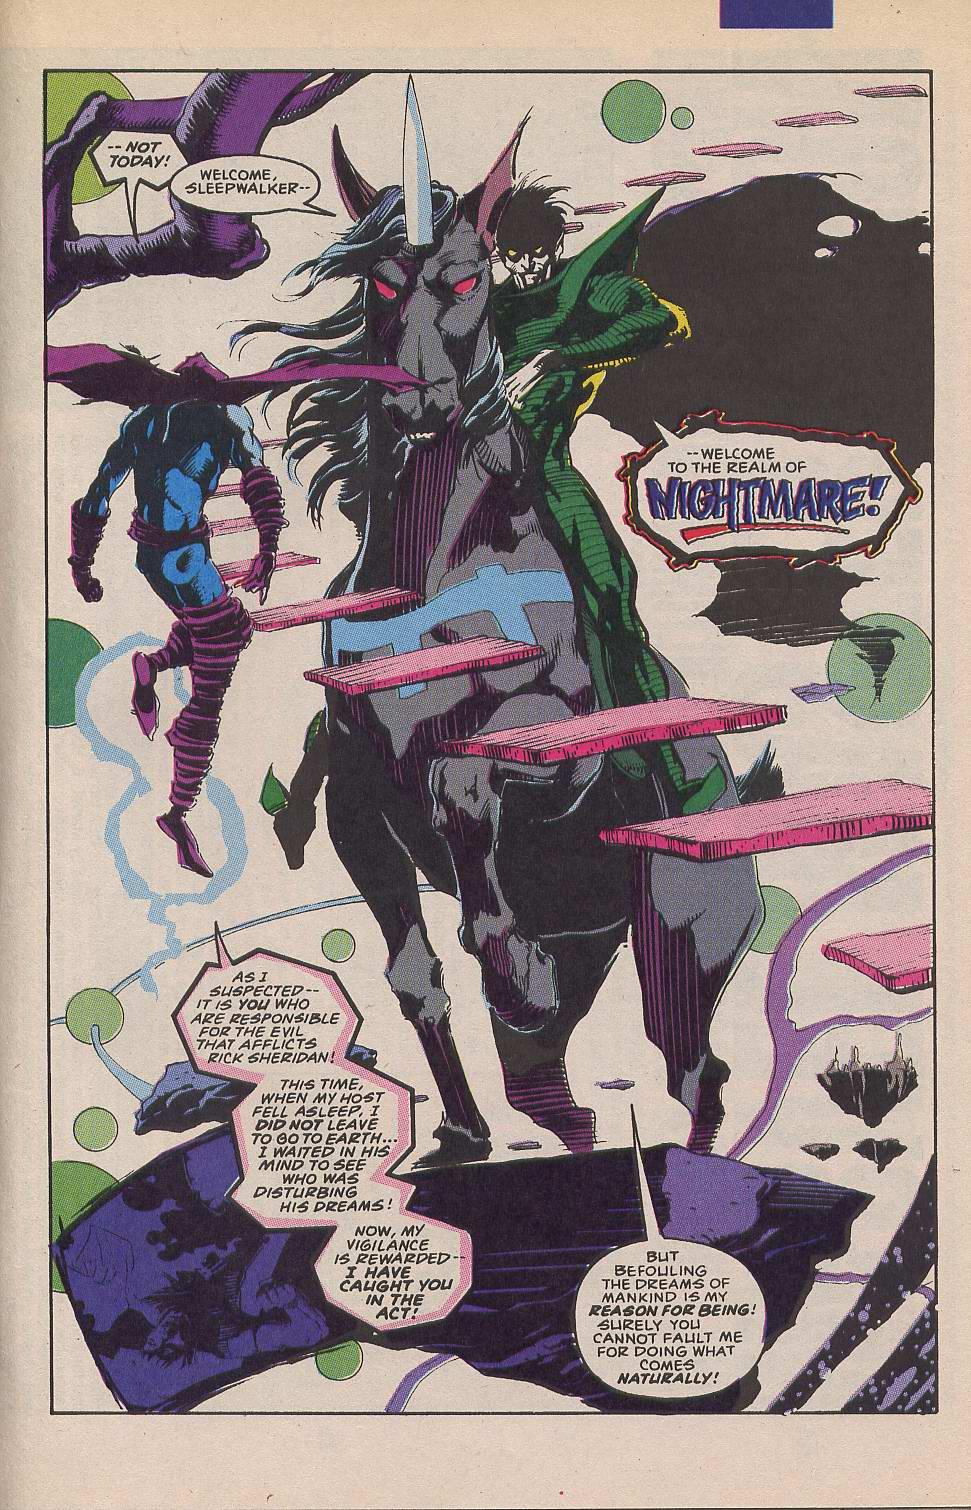 Read online Sleepwalker comic -  Issue #12 - 16